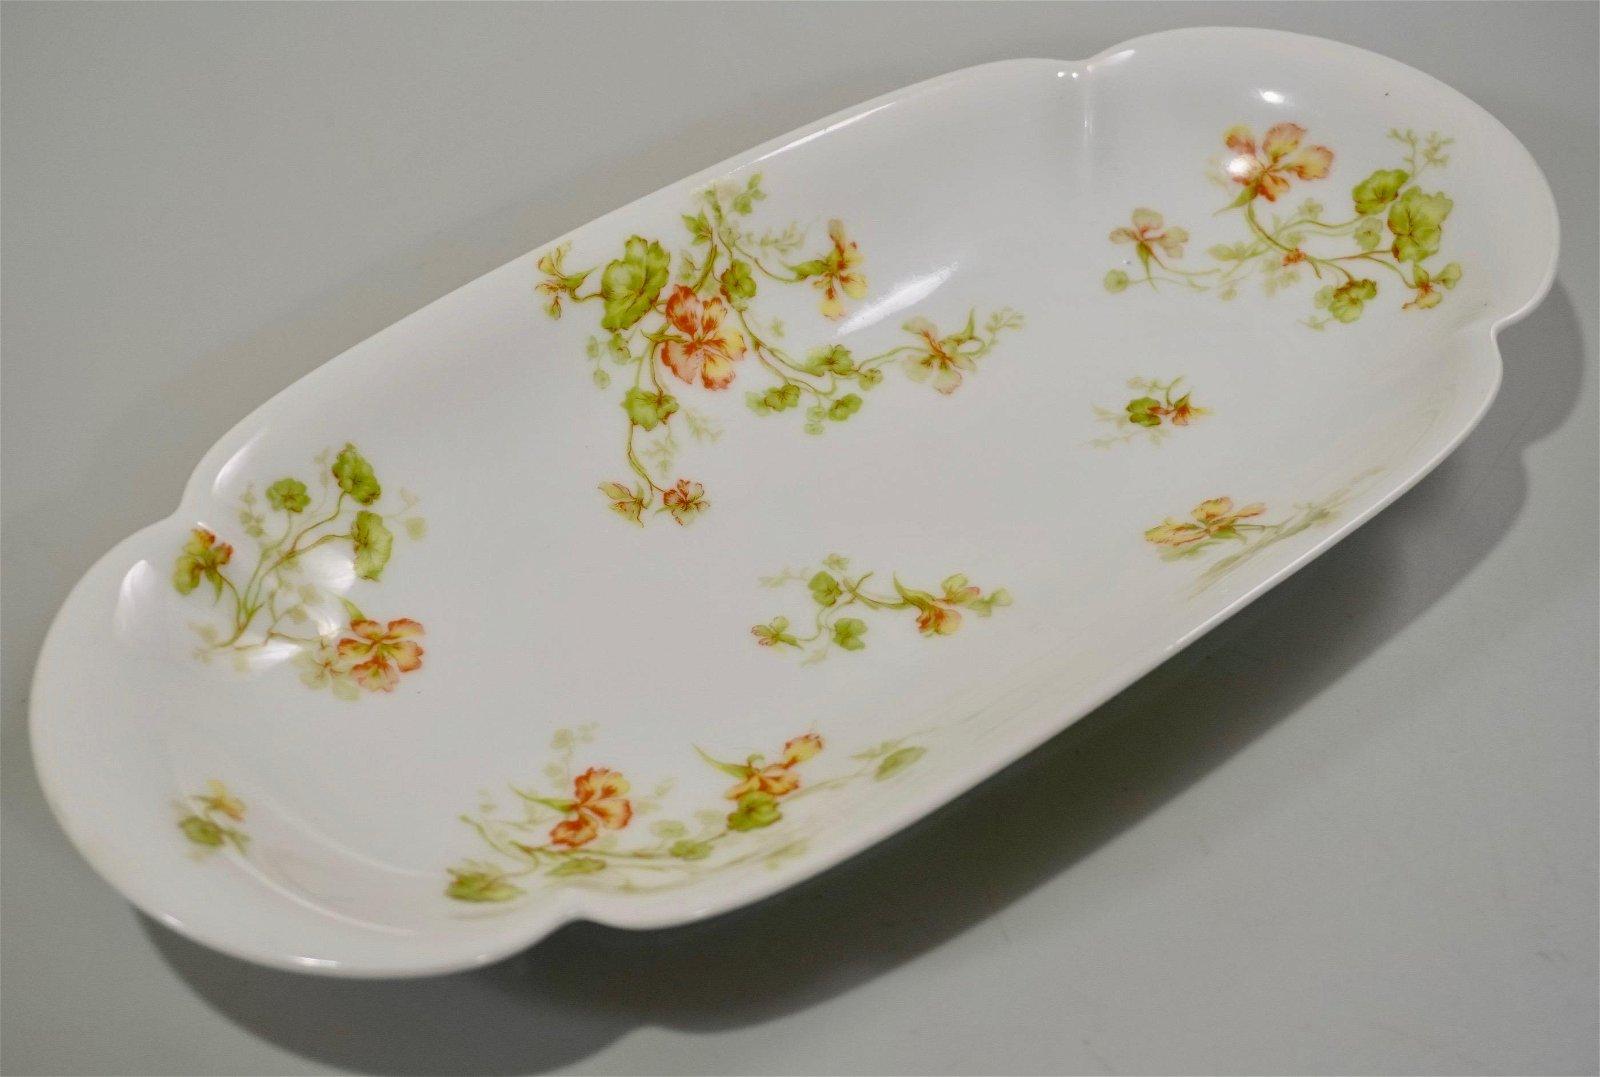 Haviland Limoges China Celery Dish France c1900 Antique